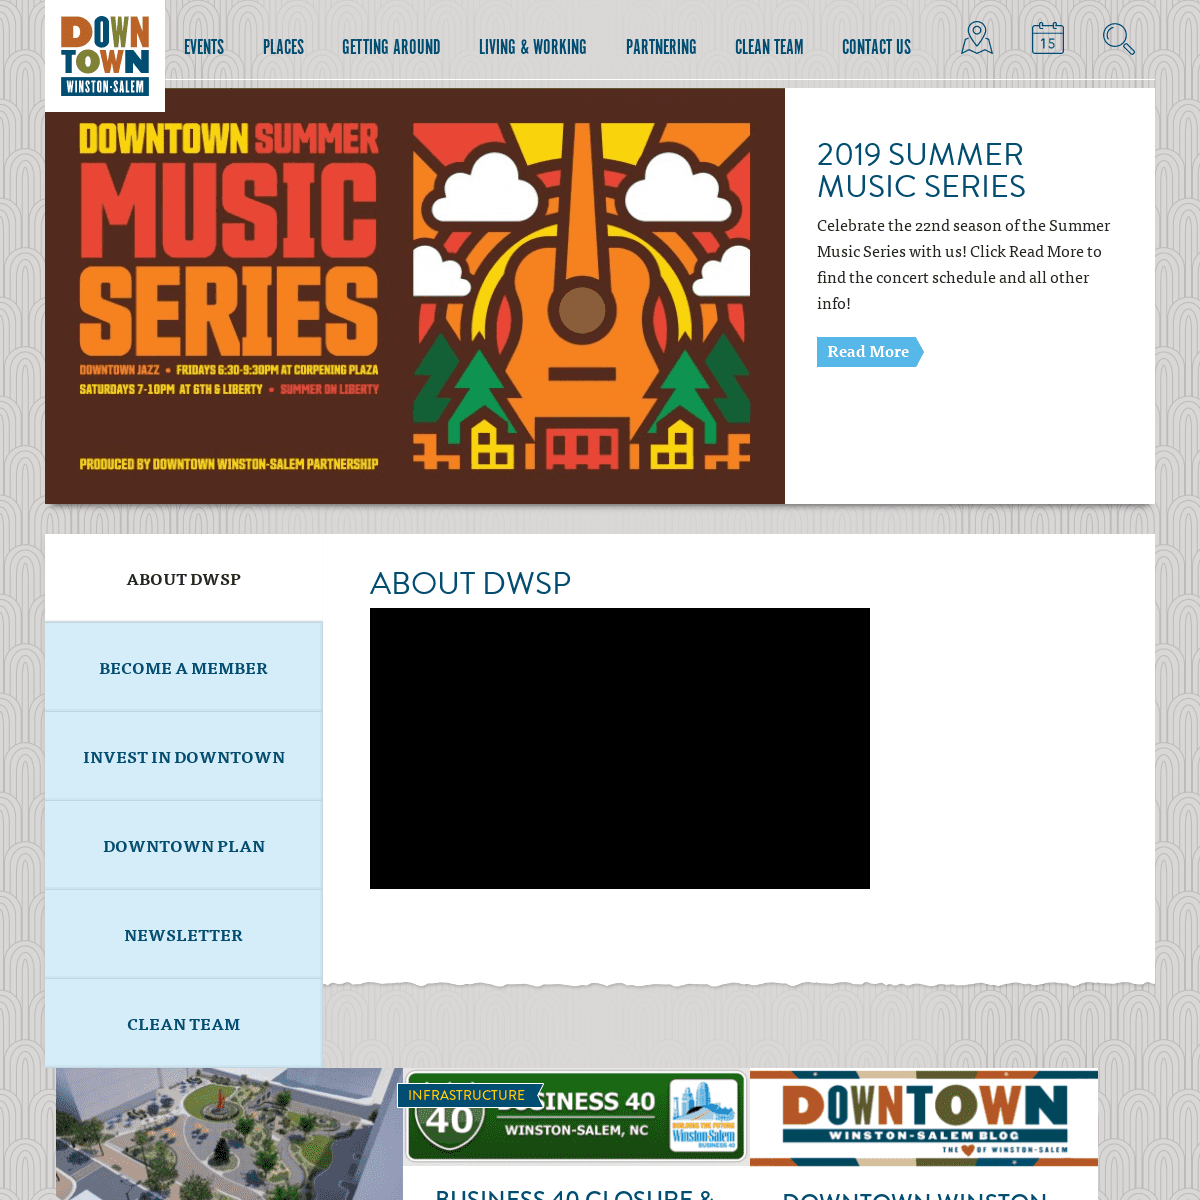 The Downtown Winston-Salem Partnership - Winston-Salem, NC